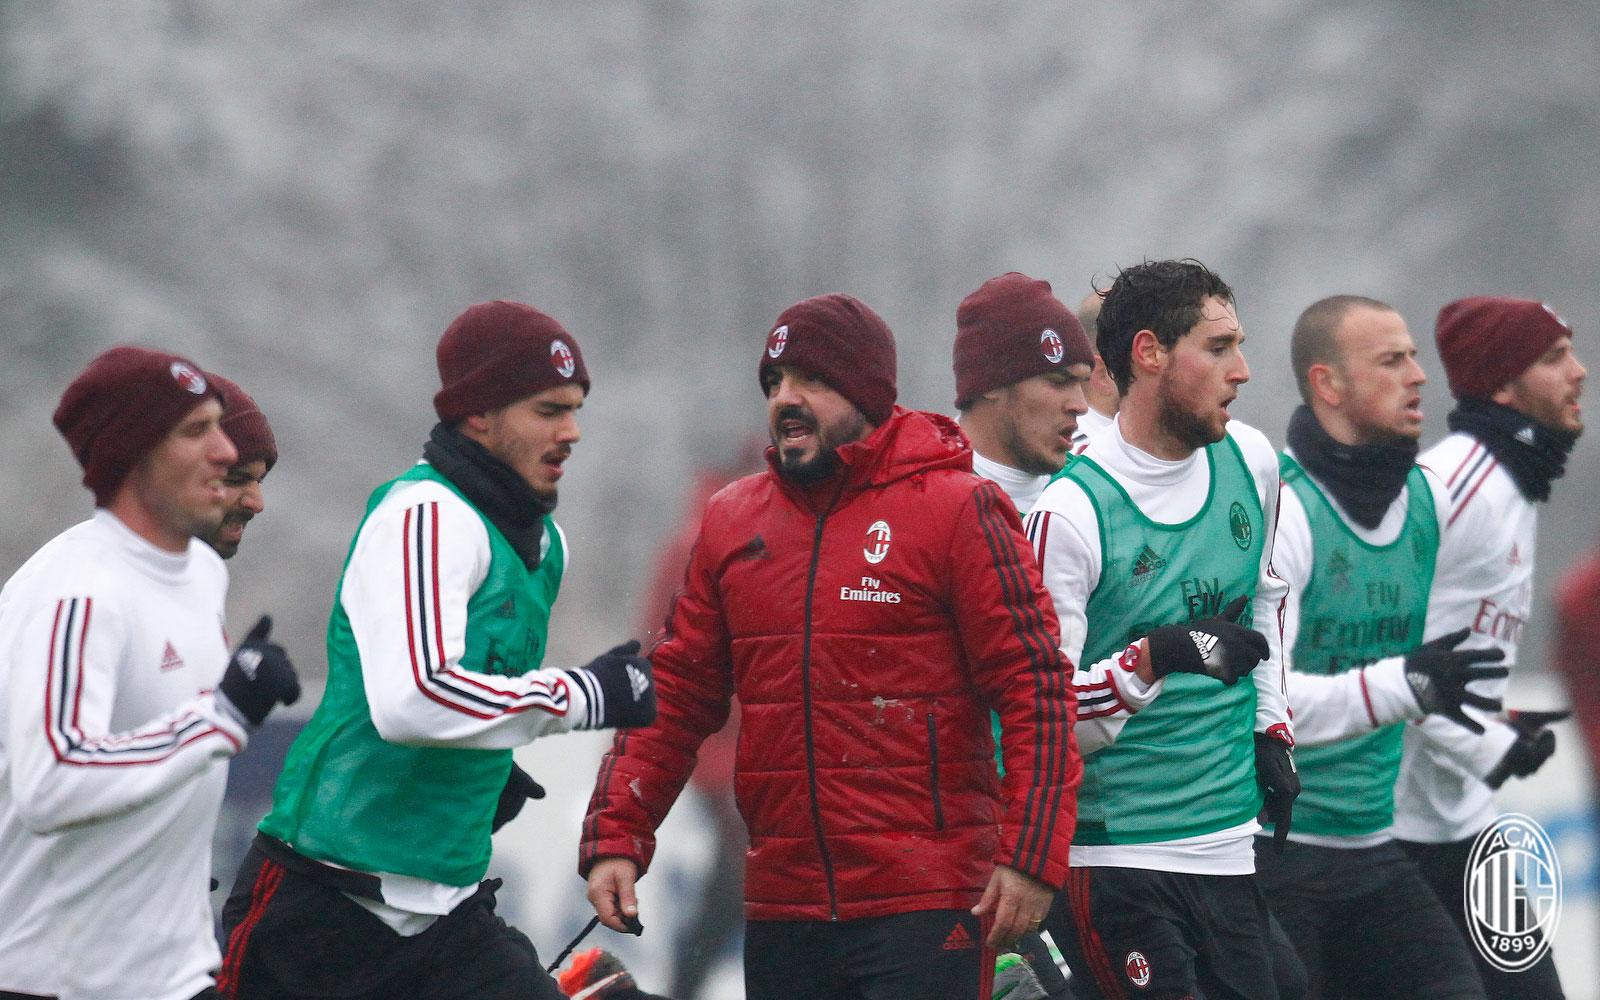 Gennaro Gattuso and the squad during training at Milanello. (@acmilan.com)